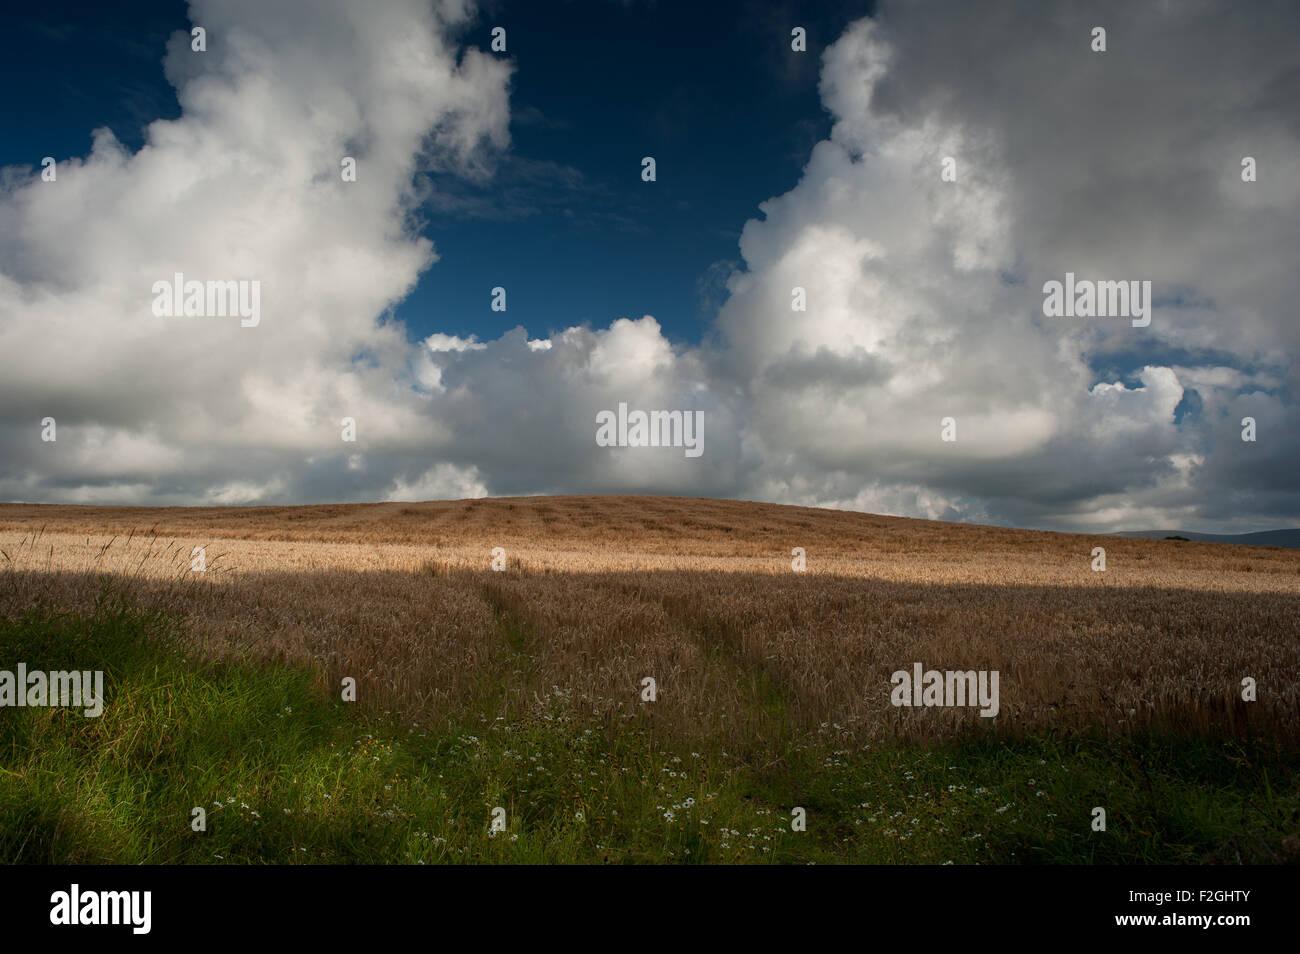 Cumulonimbus clouds over wheat corn field - Stock Image